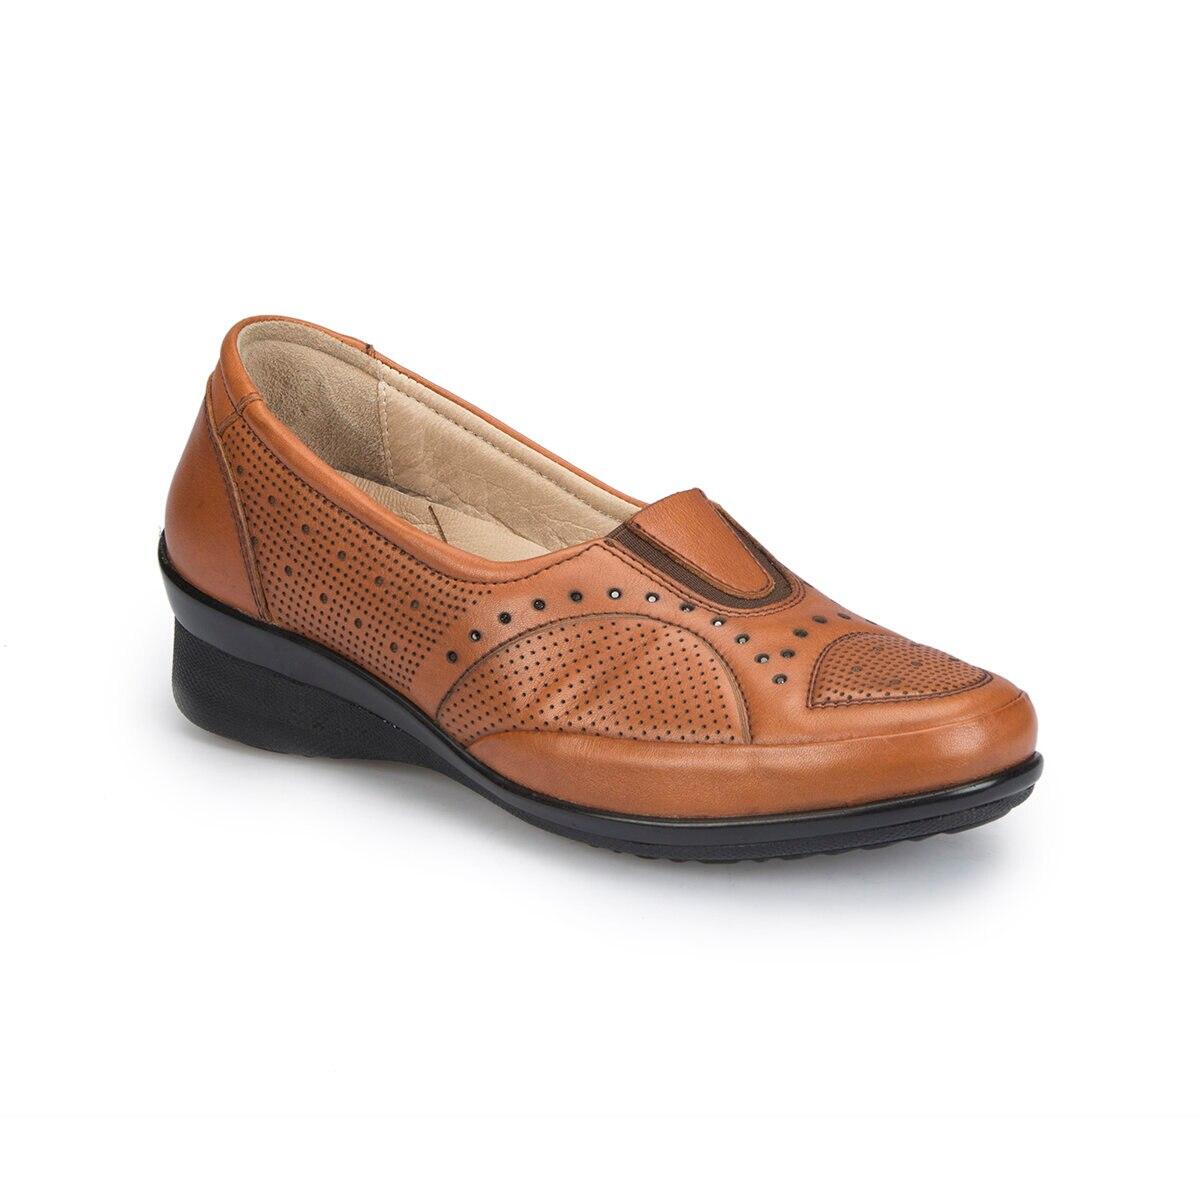 FLO 81.111063.Z Tan Women Basic Comfort Polaris 5 Point